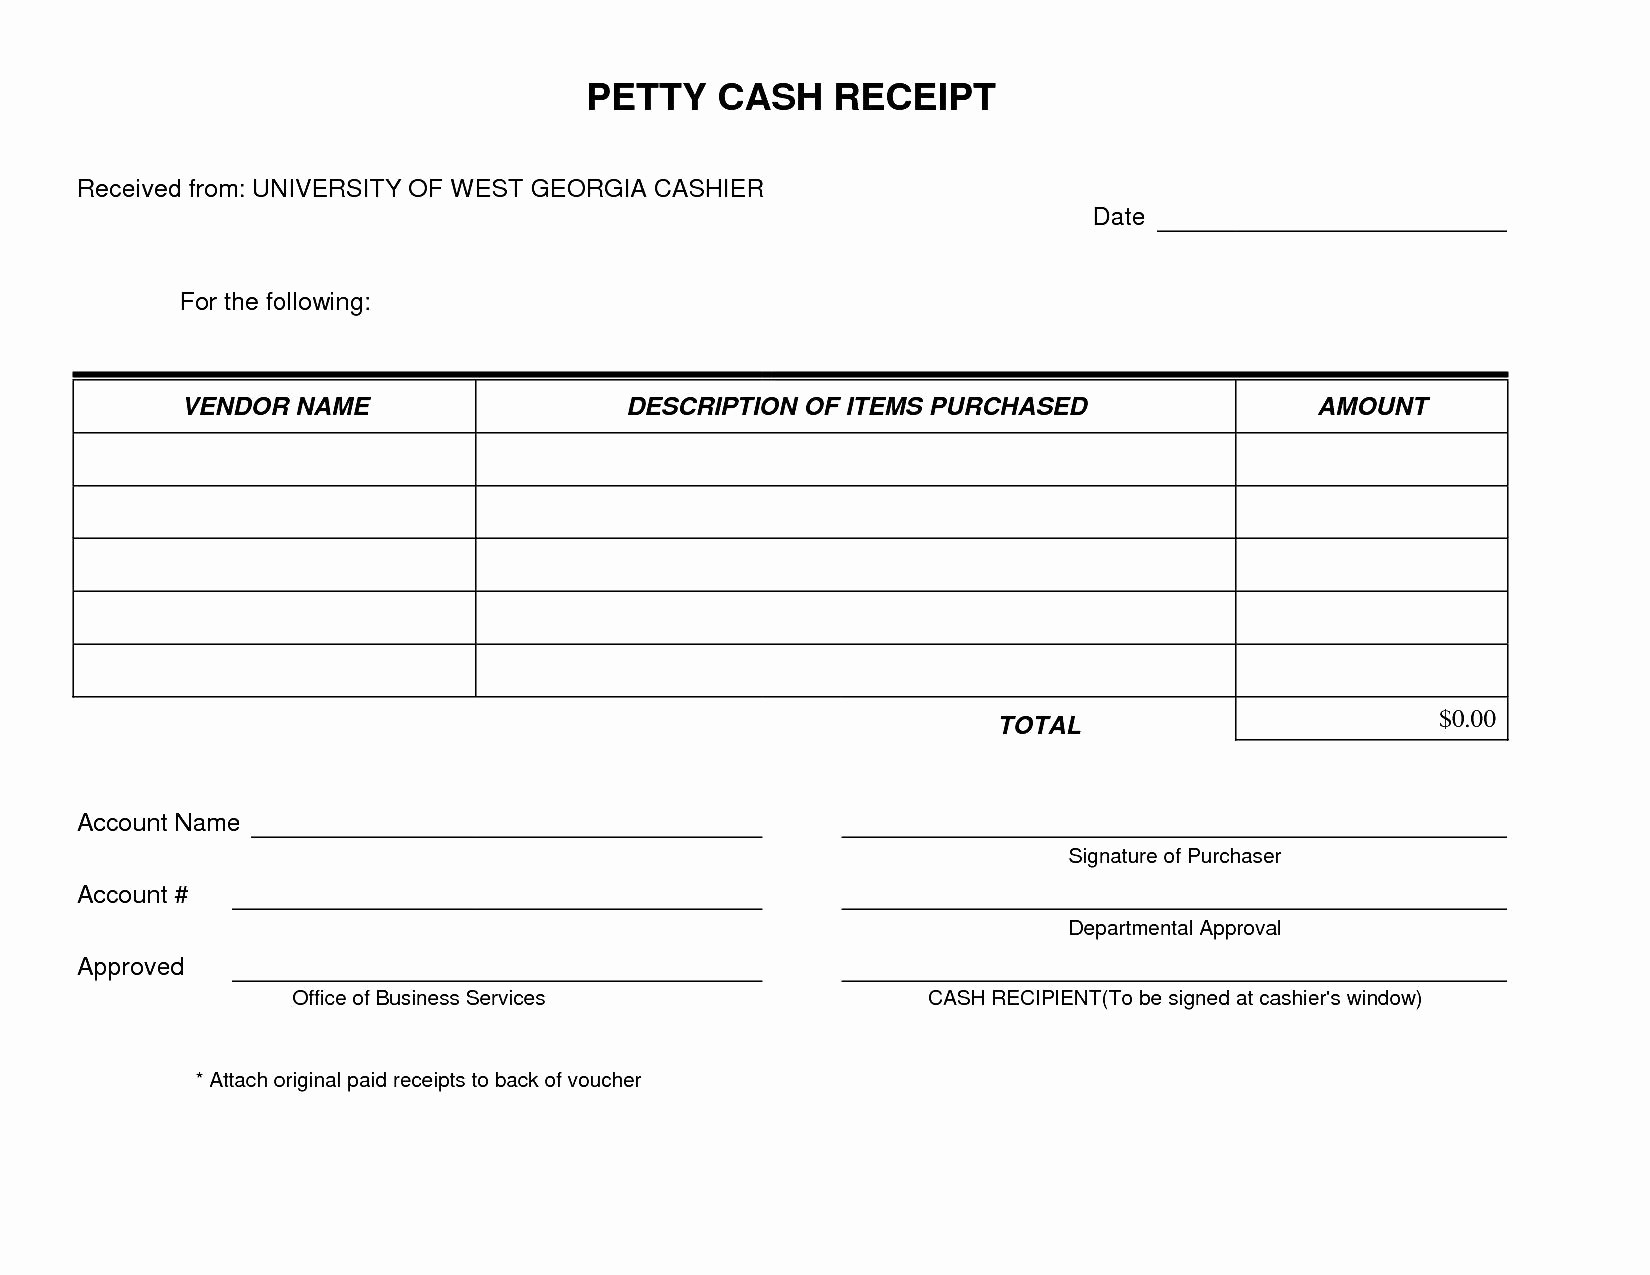 Petty Cash Receipt Template Free Awesome Cash Receipt form Examples Vatansun